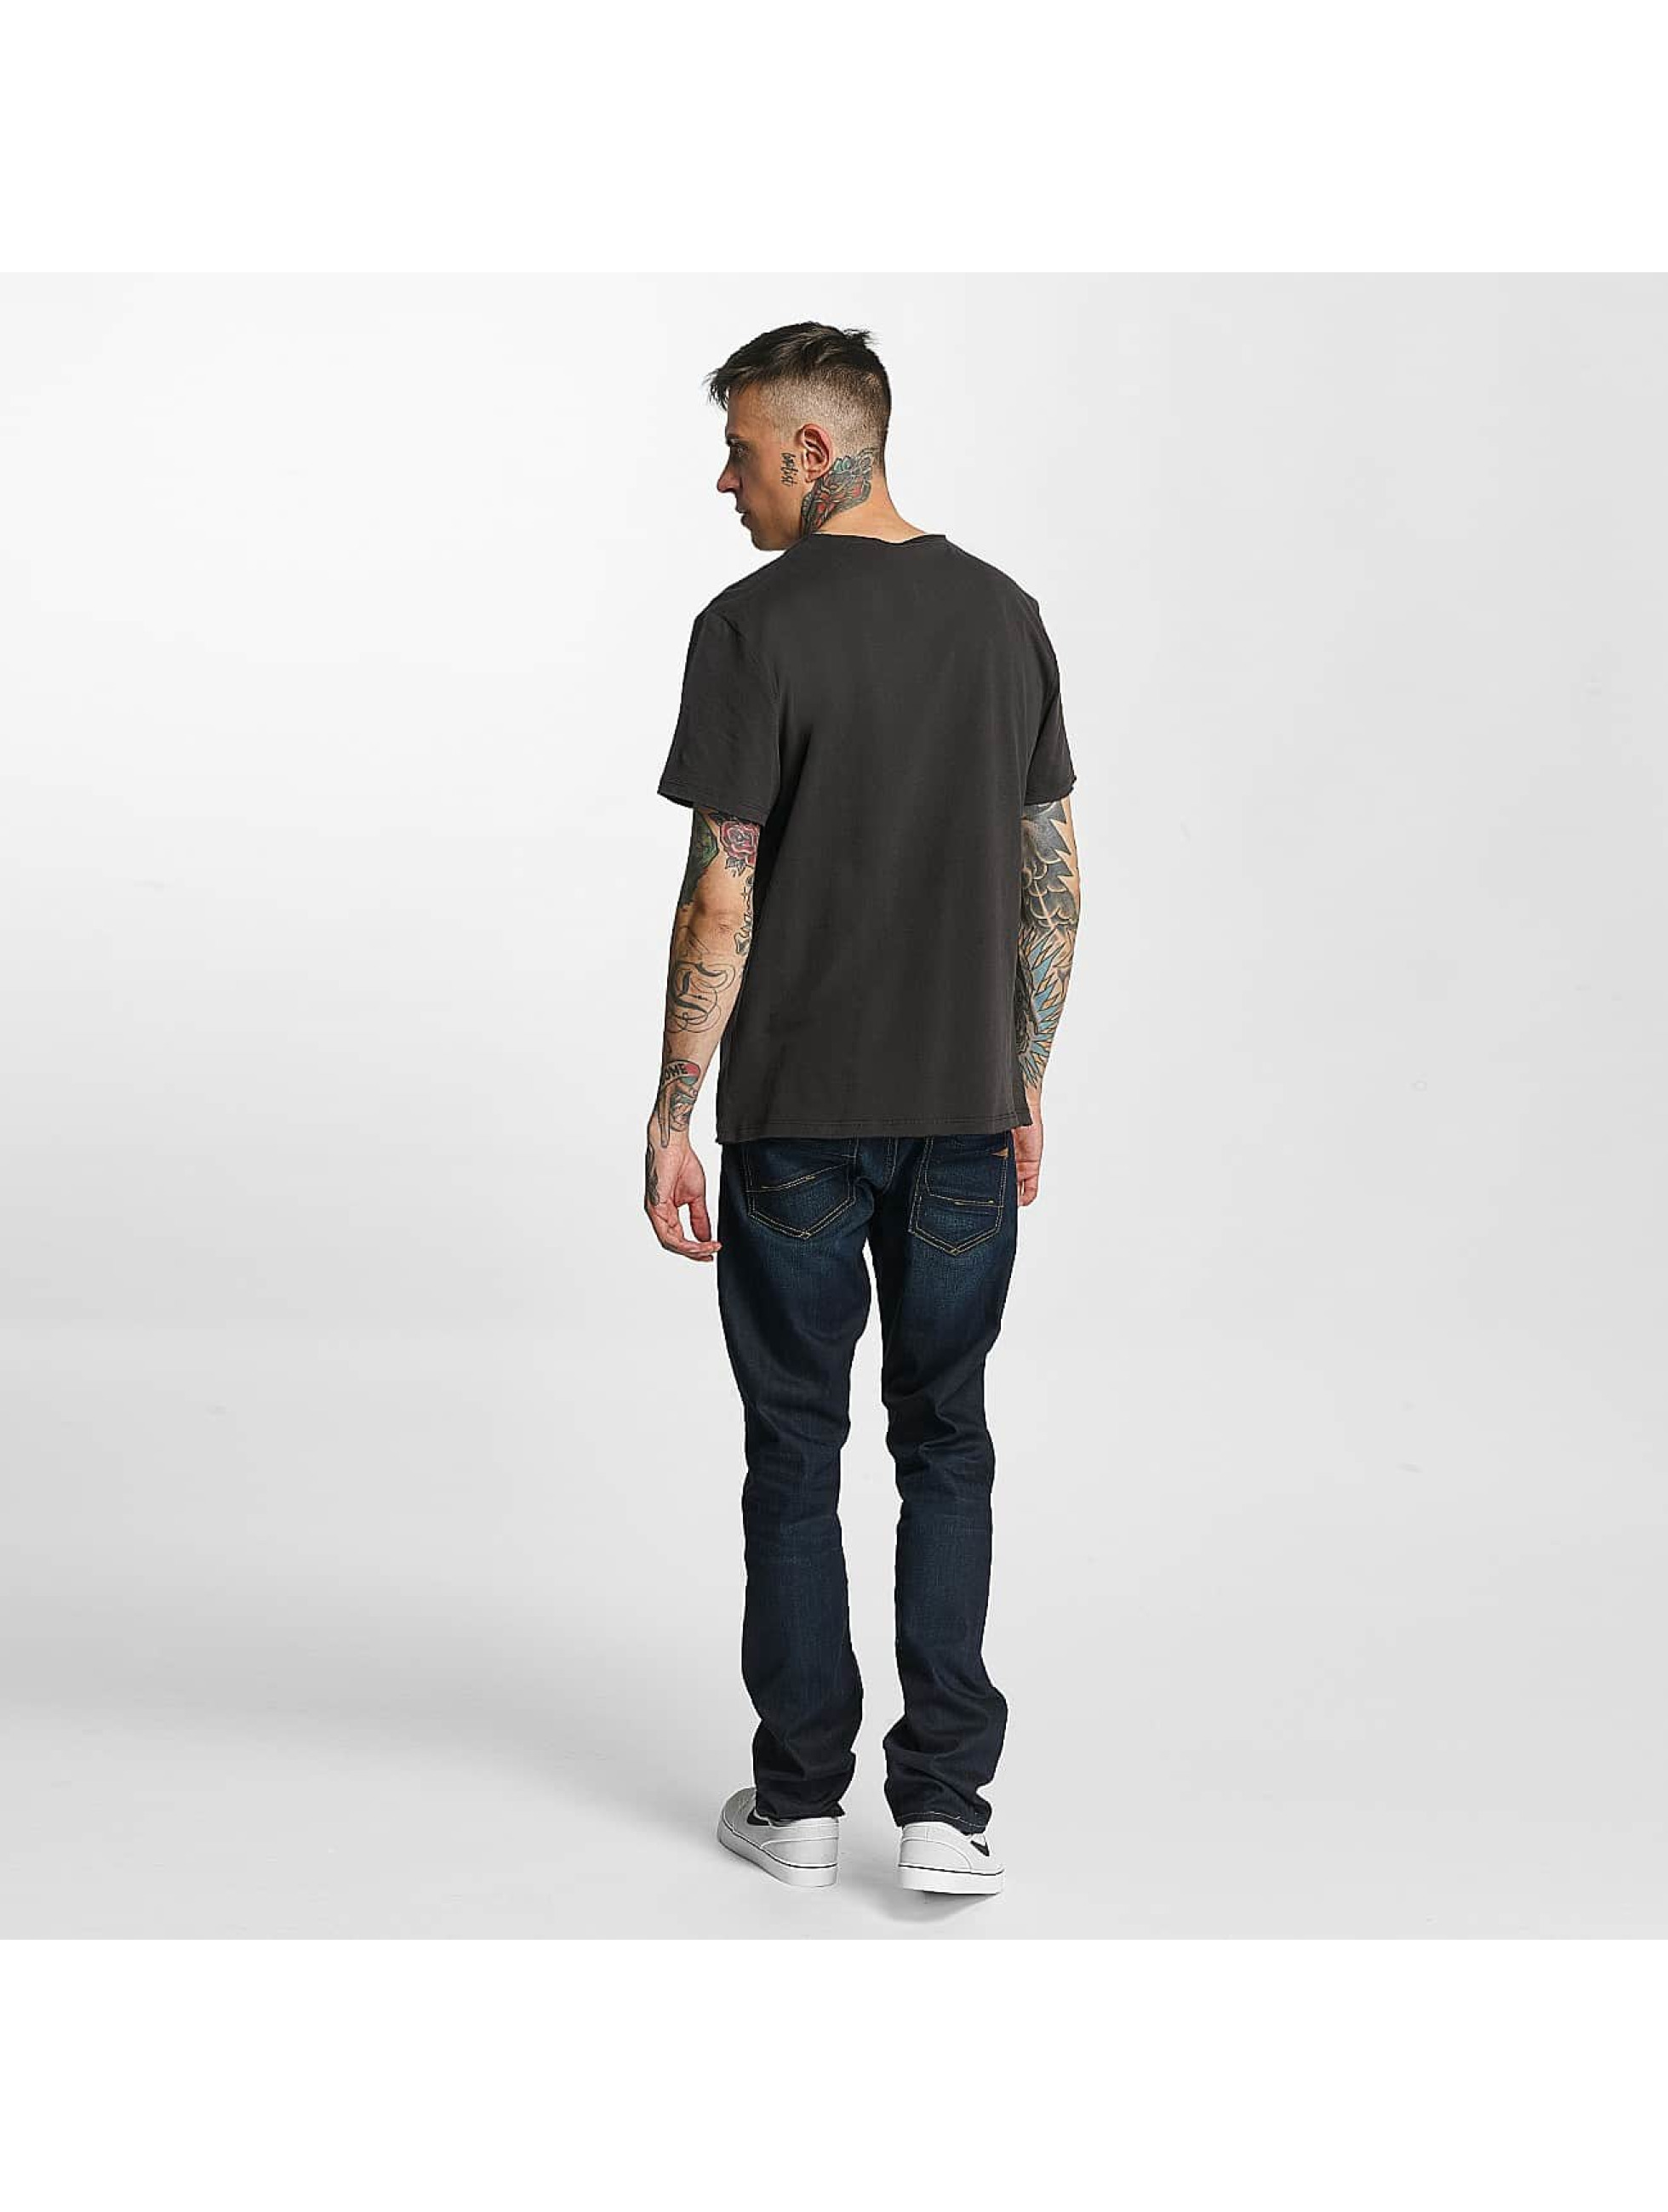 Amplified T-Shirt Run DMC Silhouette grey